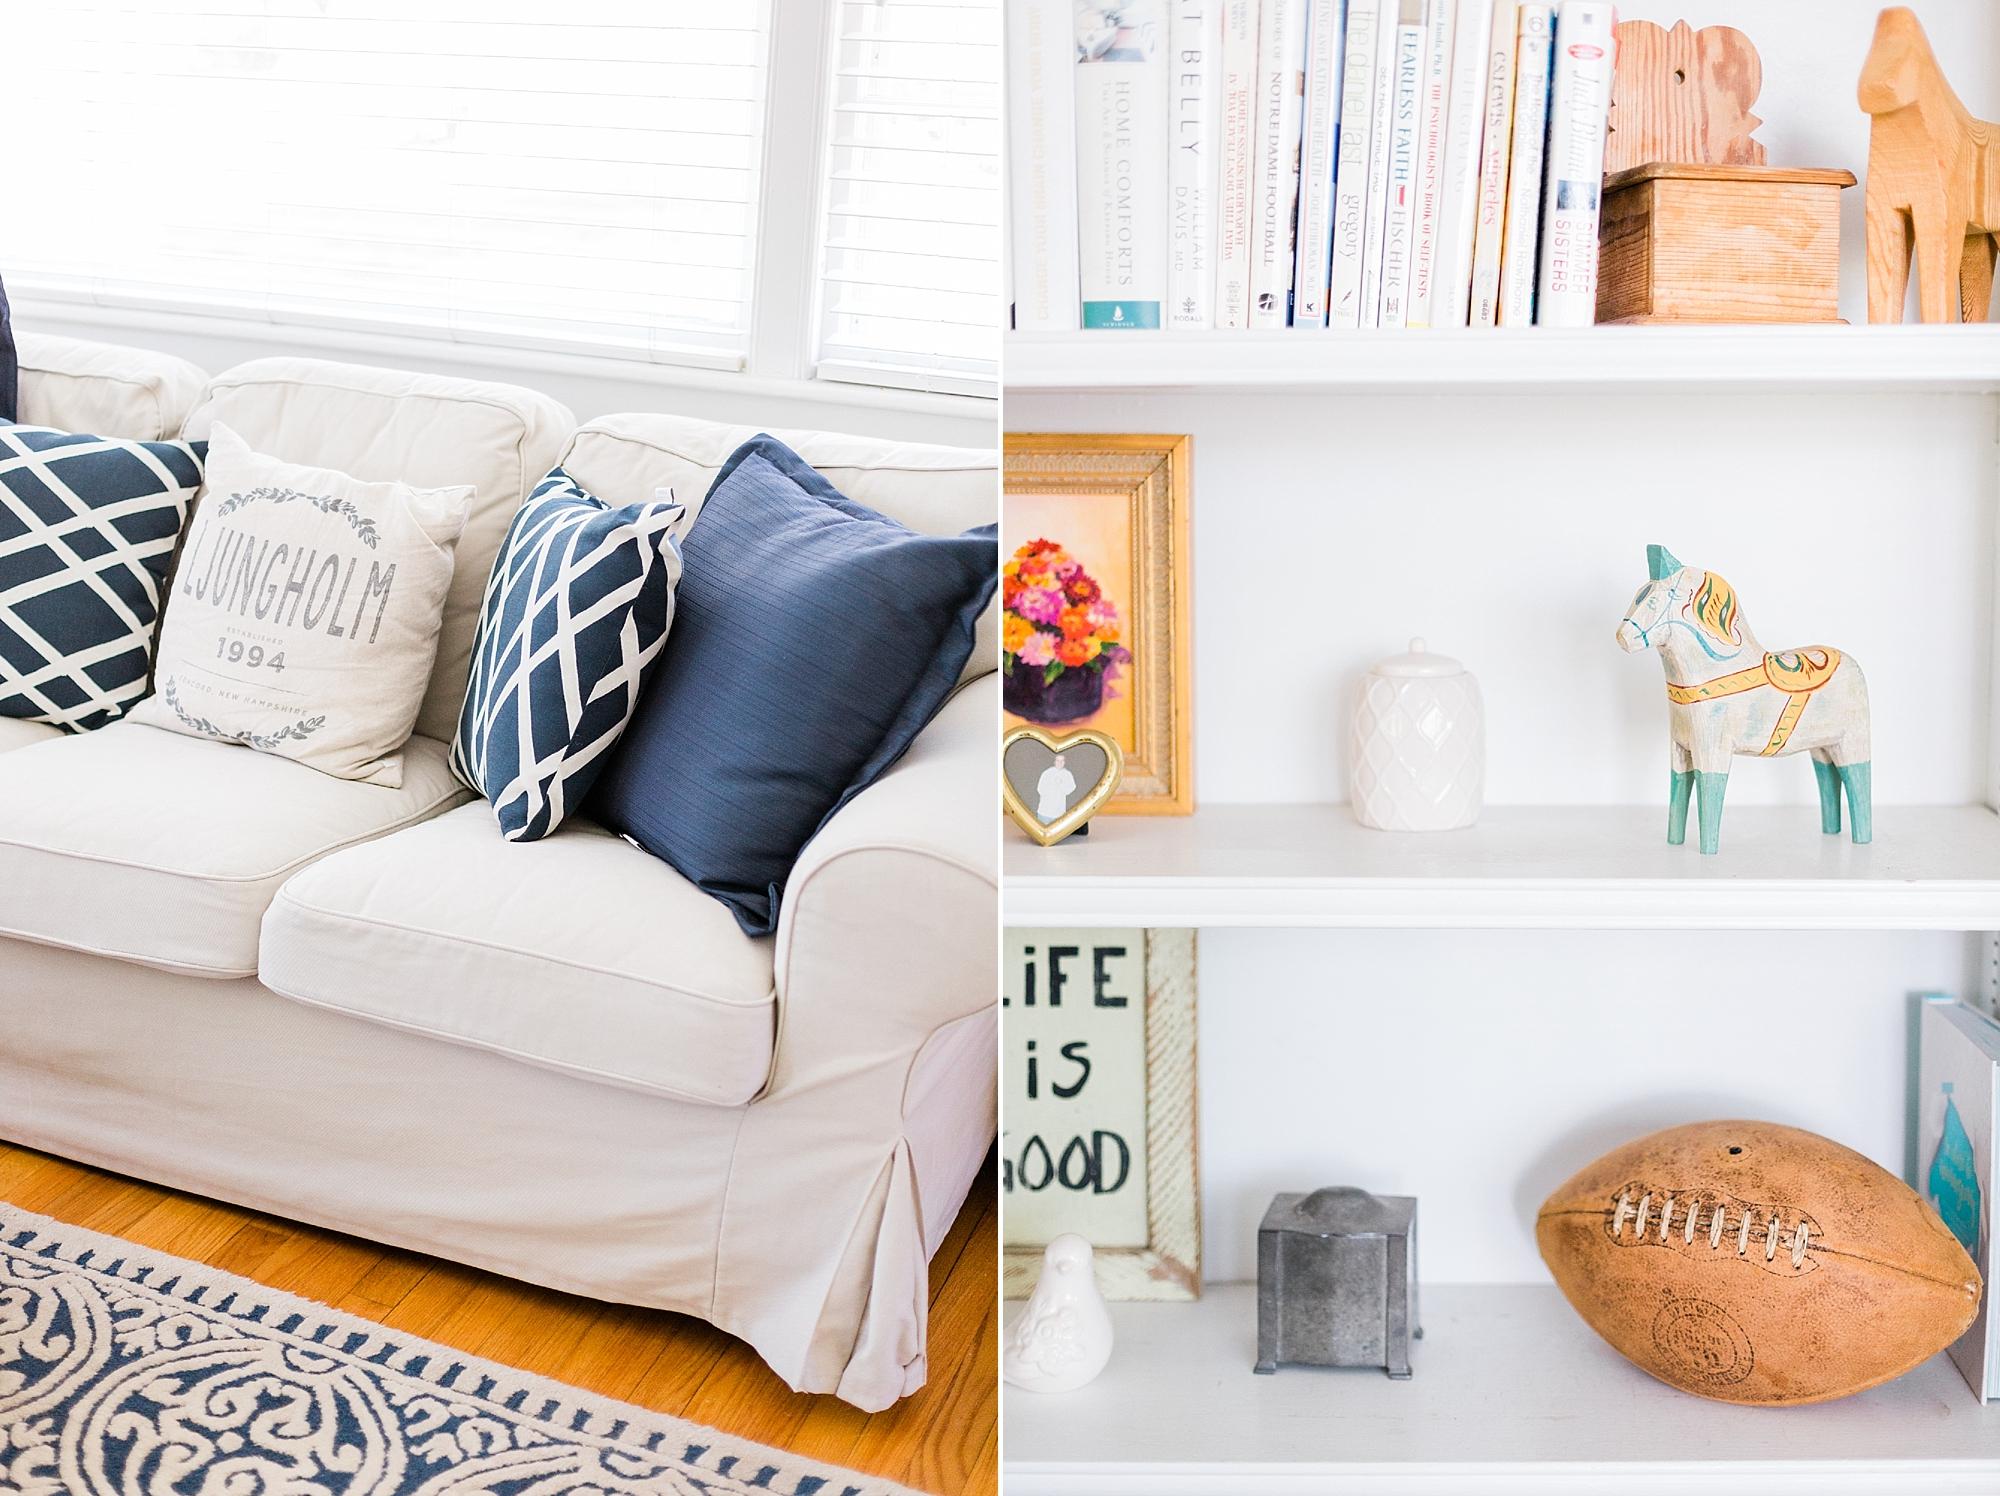 Living Room Decor - Interior Design - New Hampshire Home - Madison Rae Photography